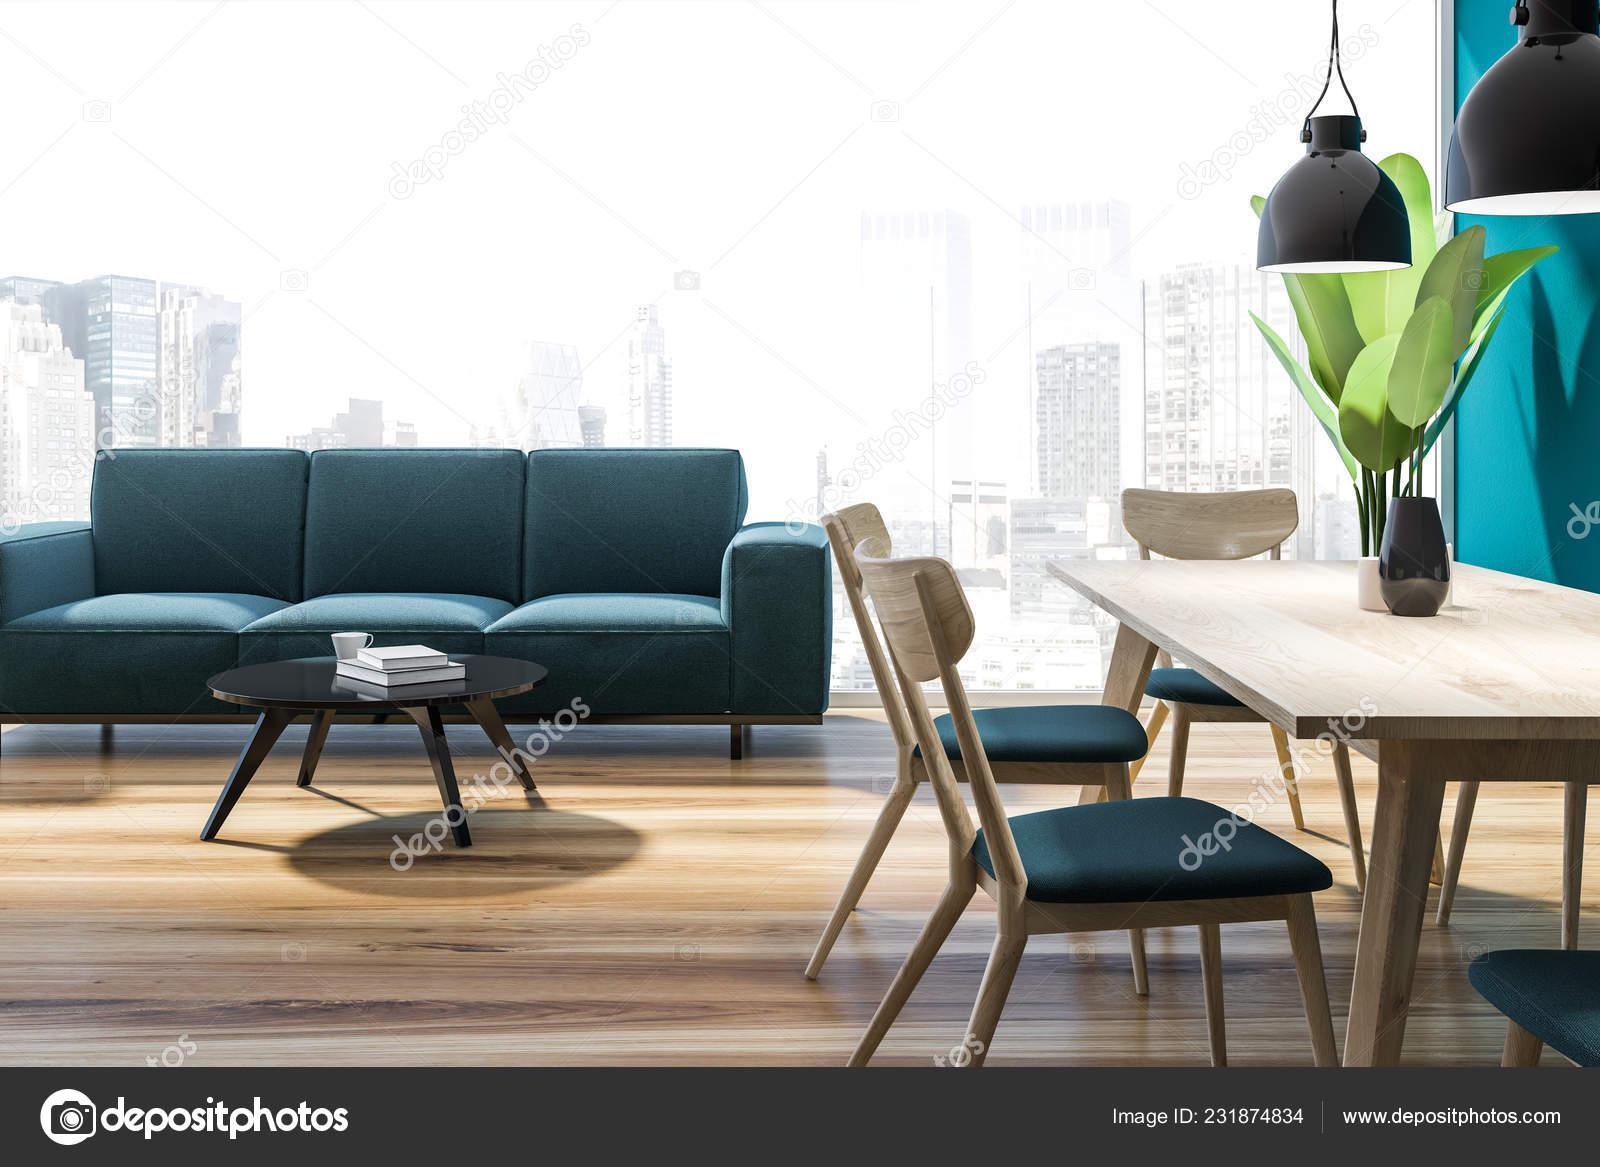 Interior Panoramic Living Room Blue Walls Wooden Floor Blue Sofa Stock Photo C Denisismagilov 231874834